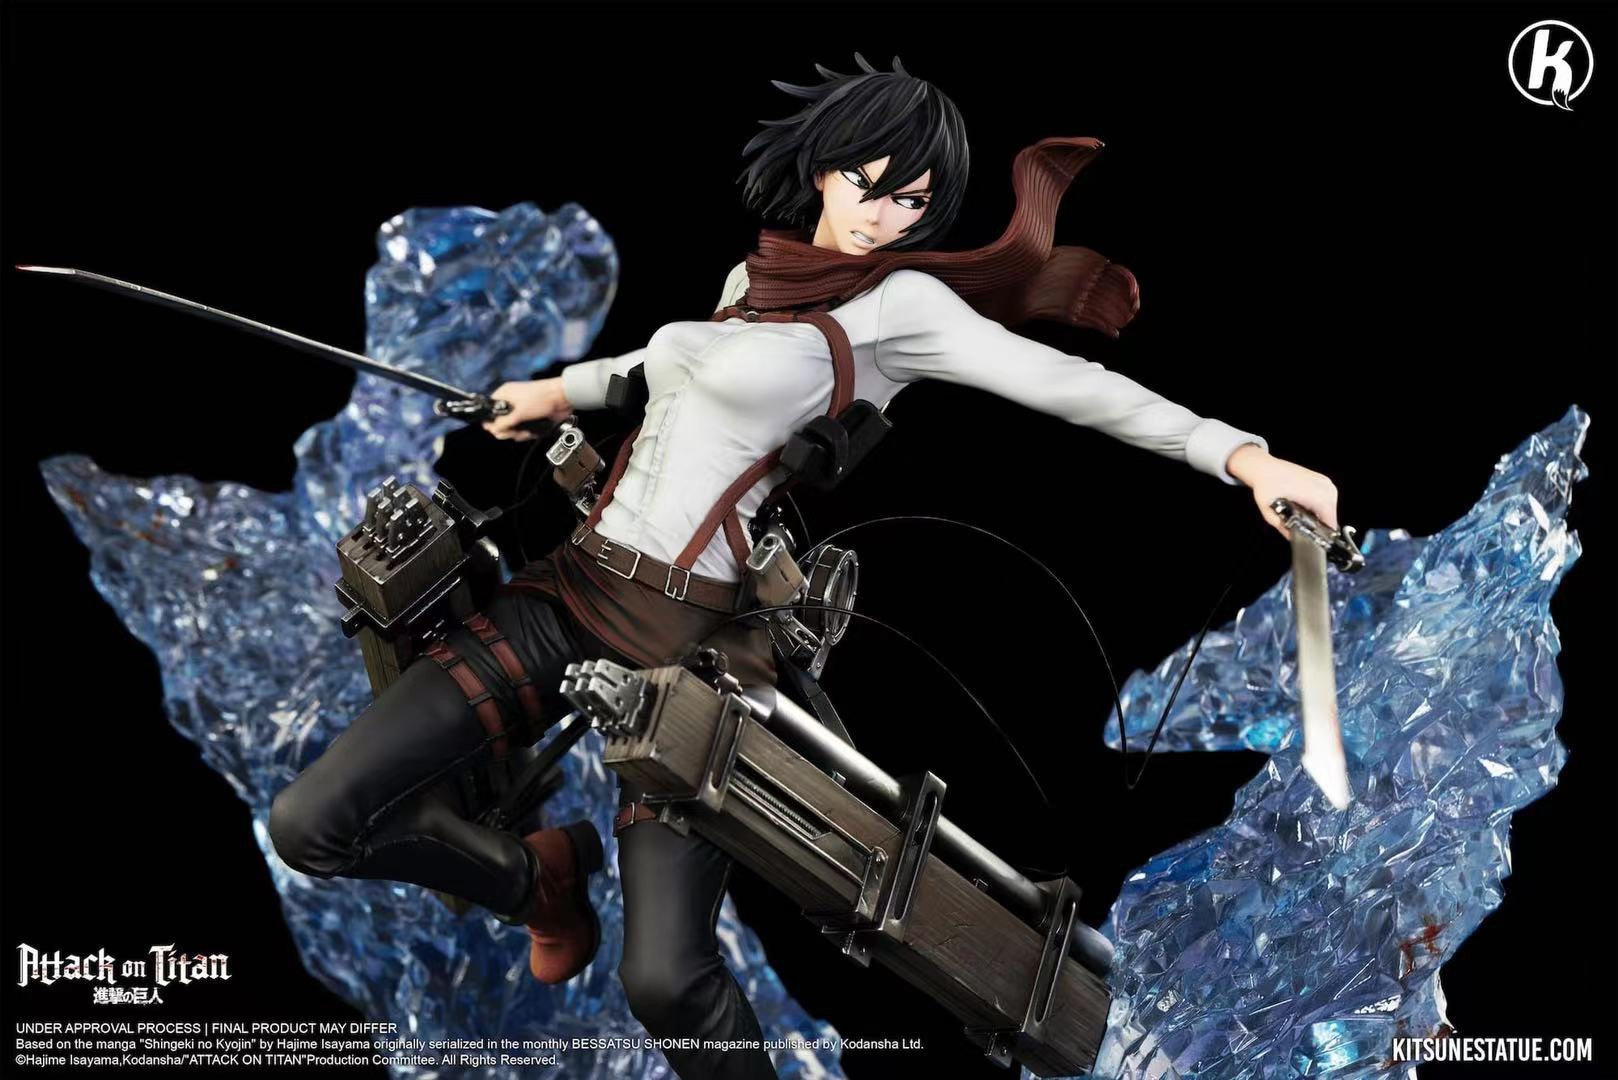 Mikasa มิคาสะ by Kitsune Statue (มัดจำ) [[SOLD OUT]]